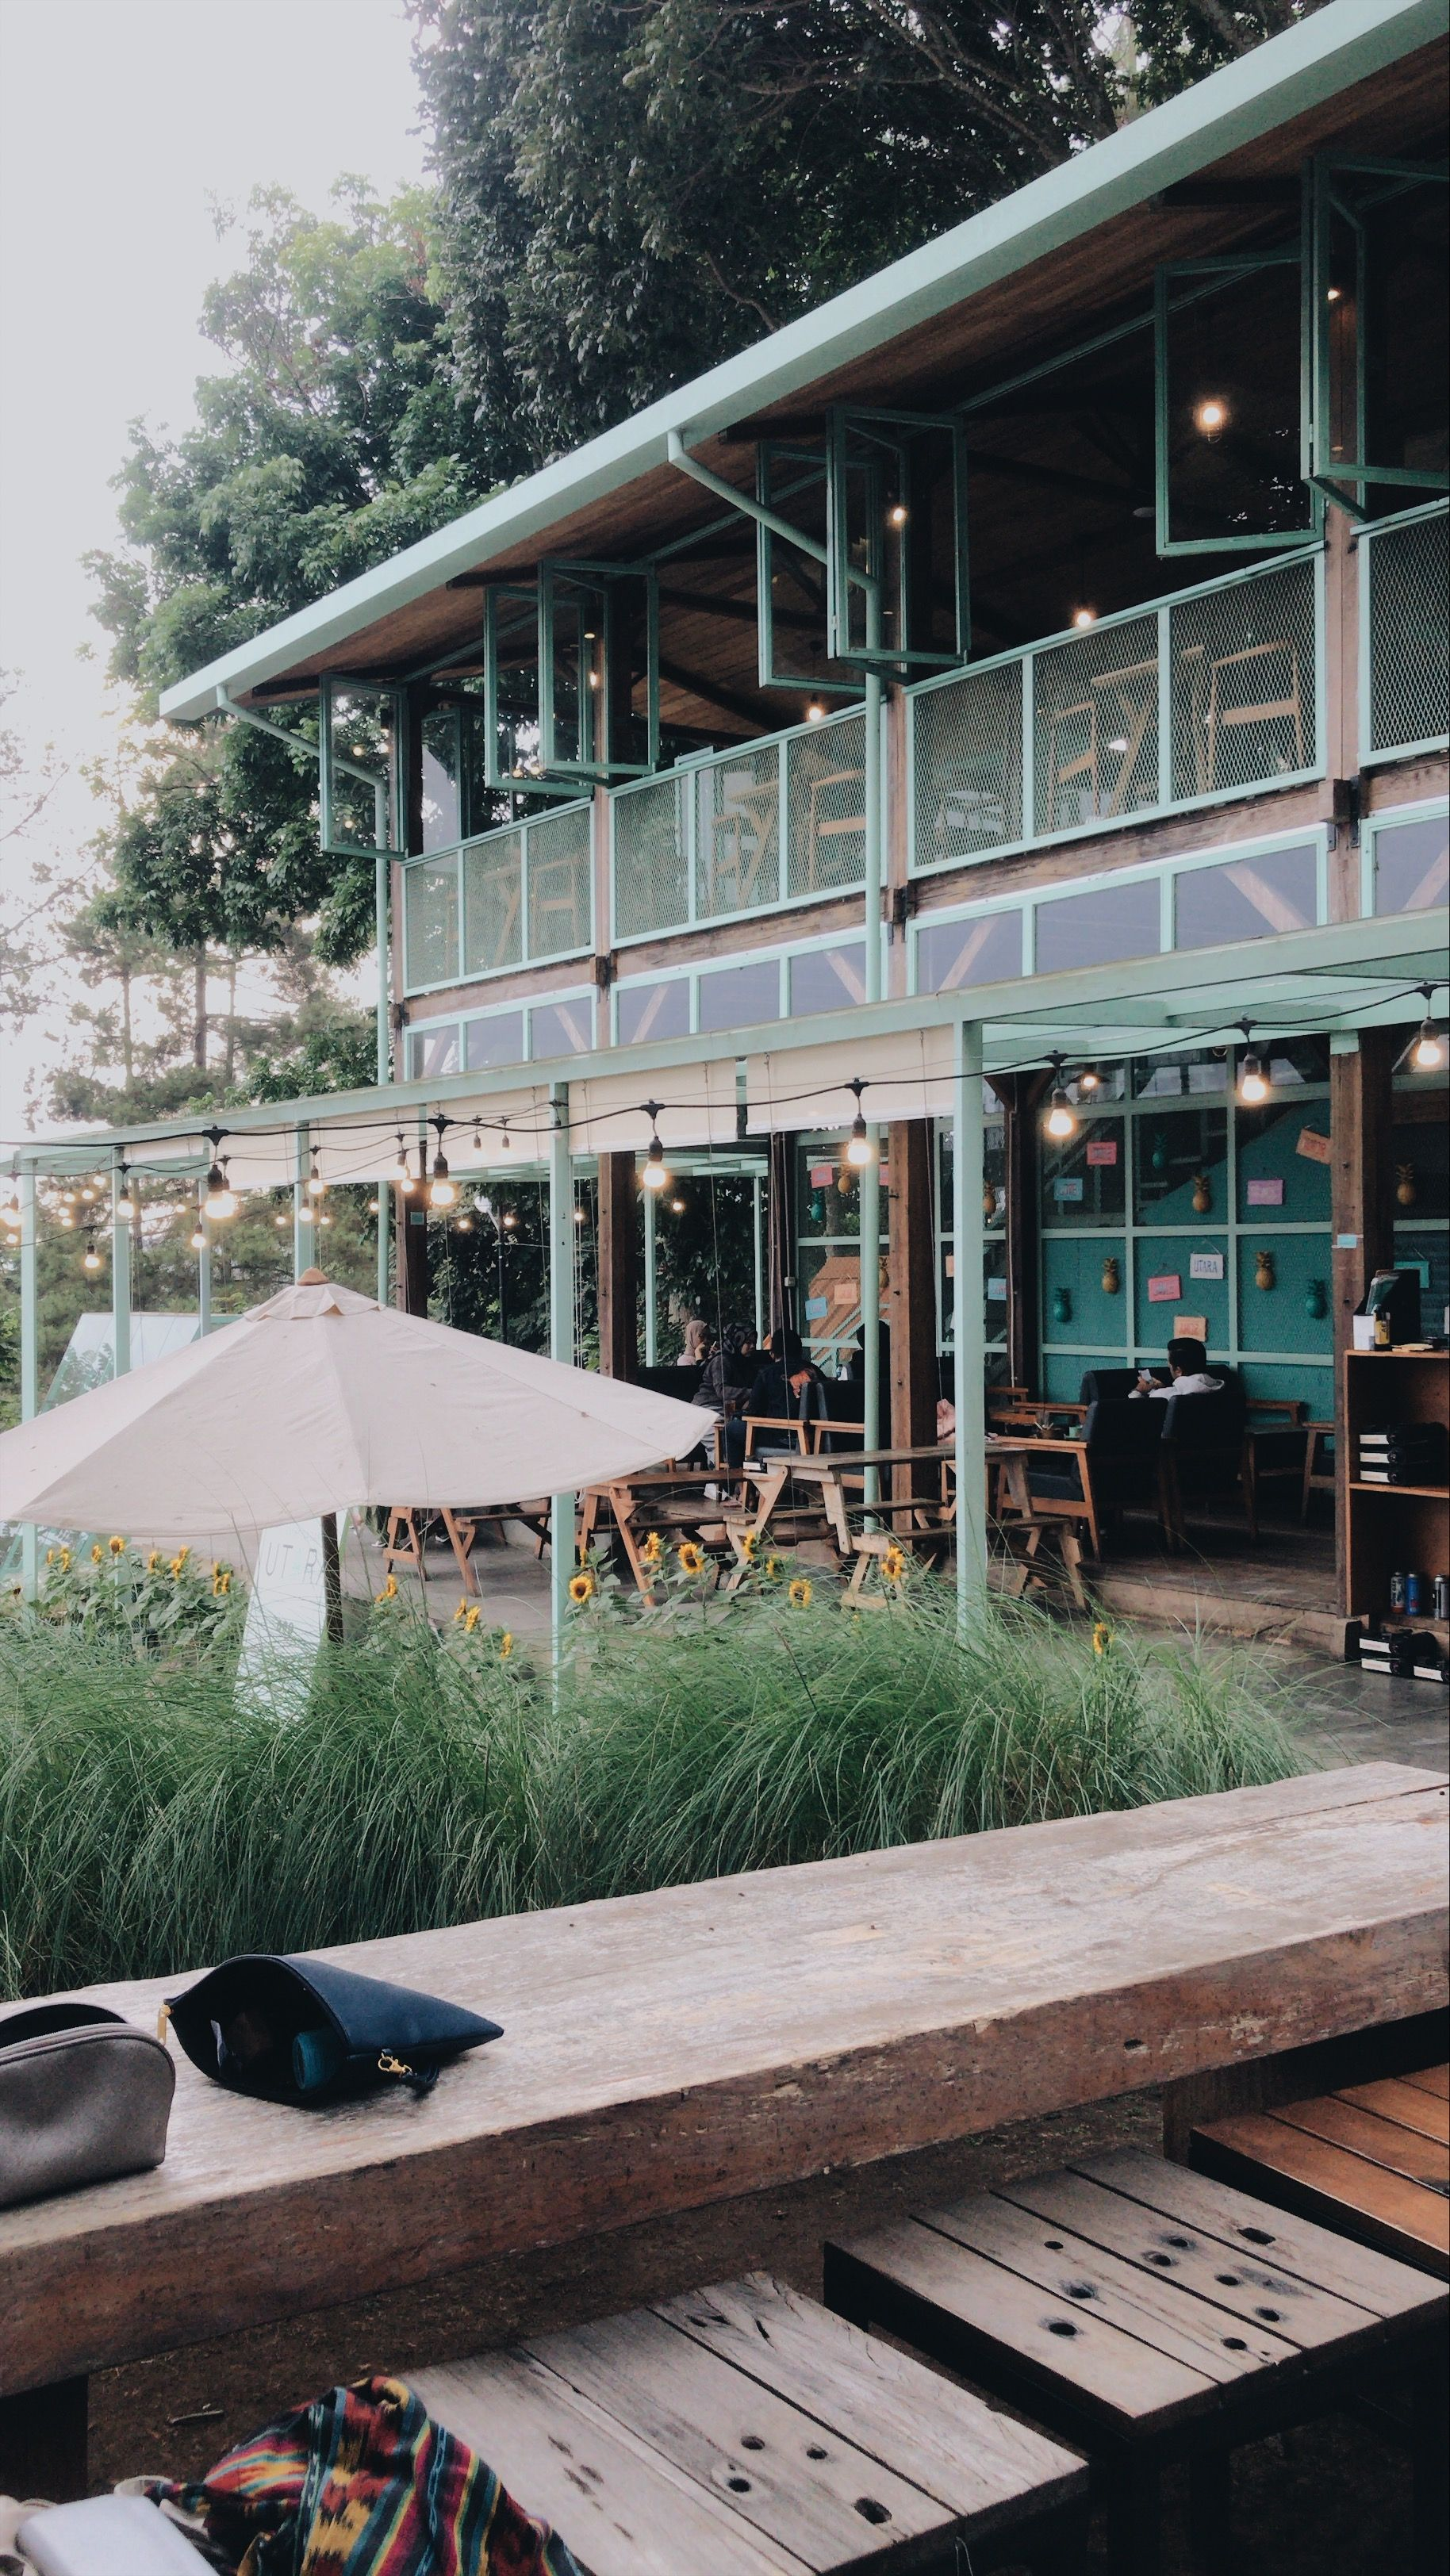 Still At Utara Cafe Bandung Di 2020 Gambar Kota Fotografi Fotografi Jalanan